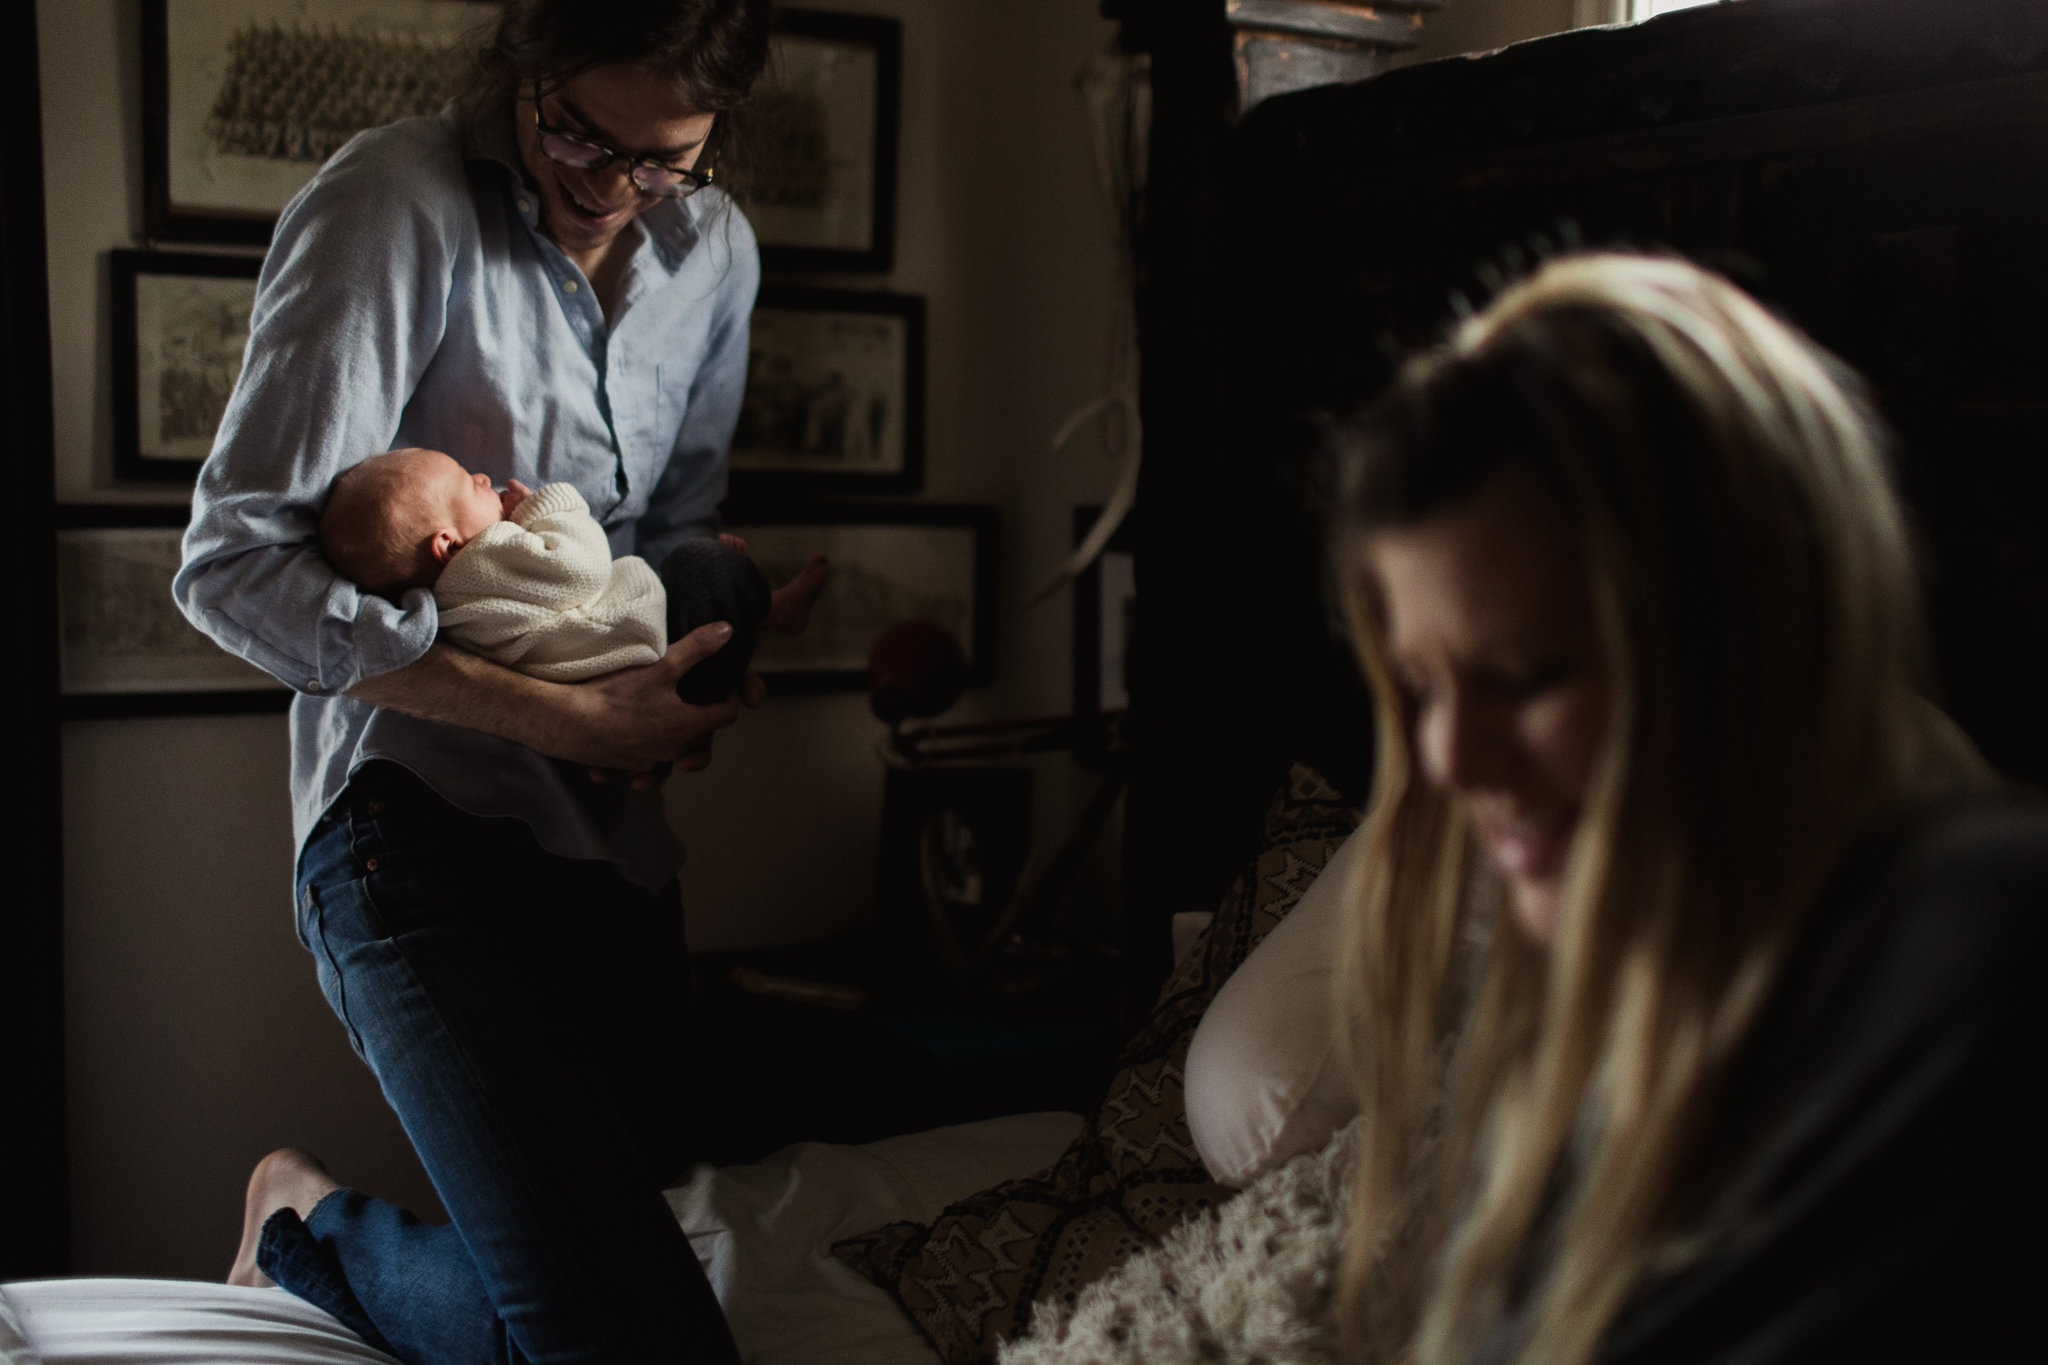 birth photographer dallas fort worth 023.jpg